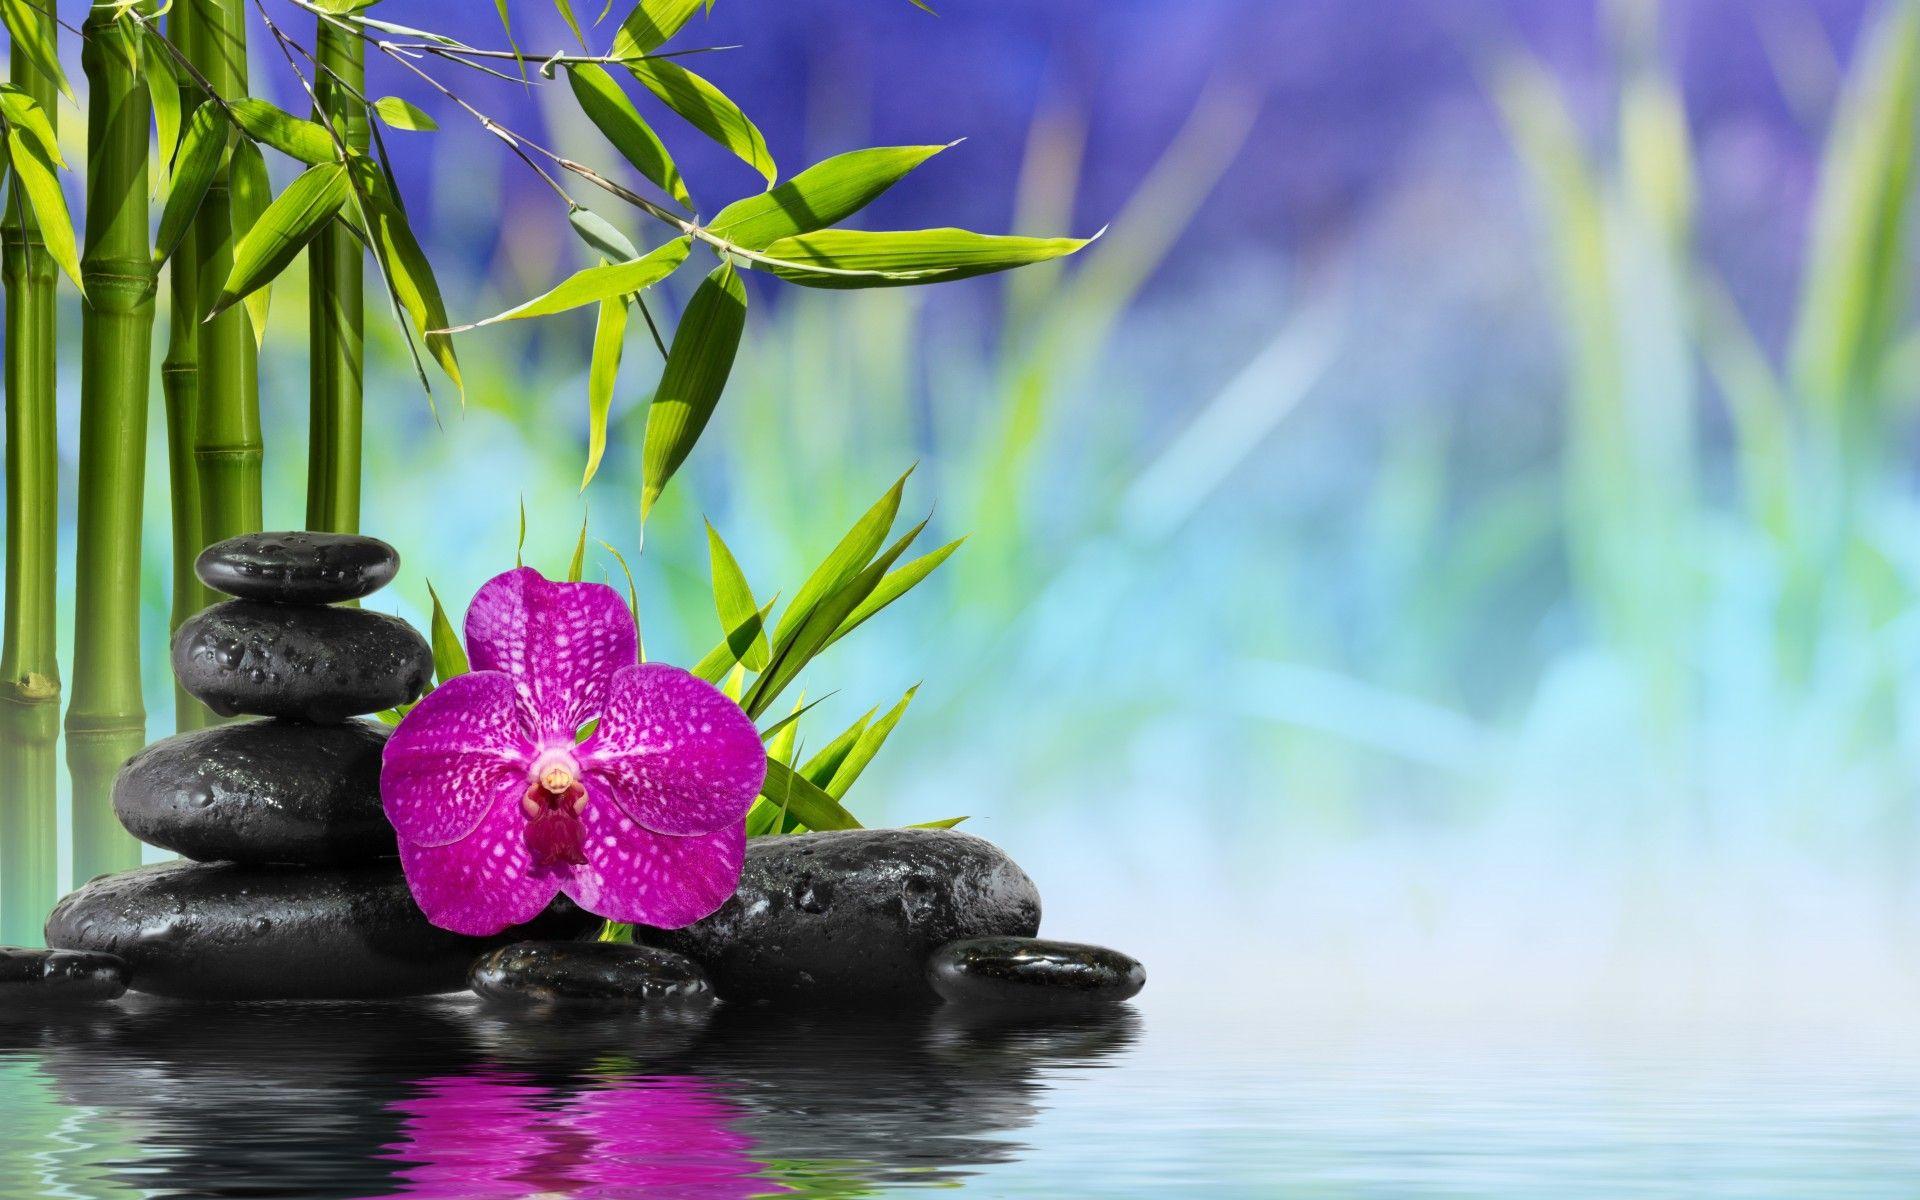 spa  zen  stones  bamboo  flower  orchid  water